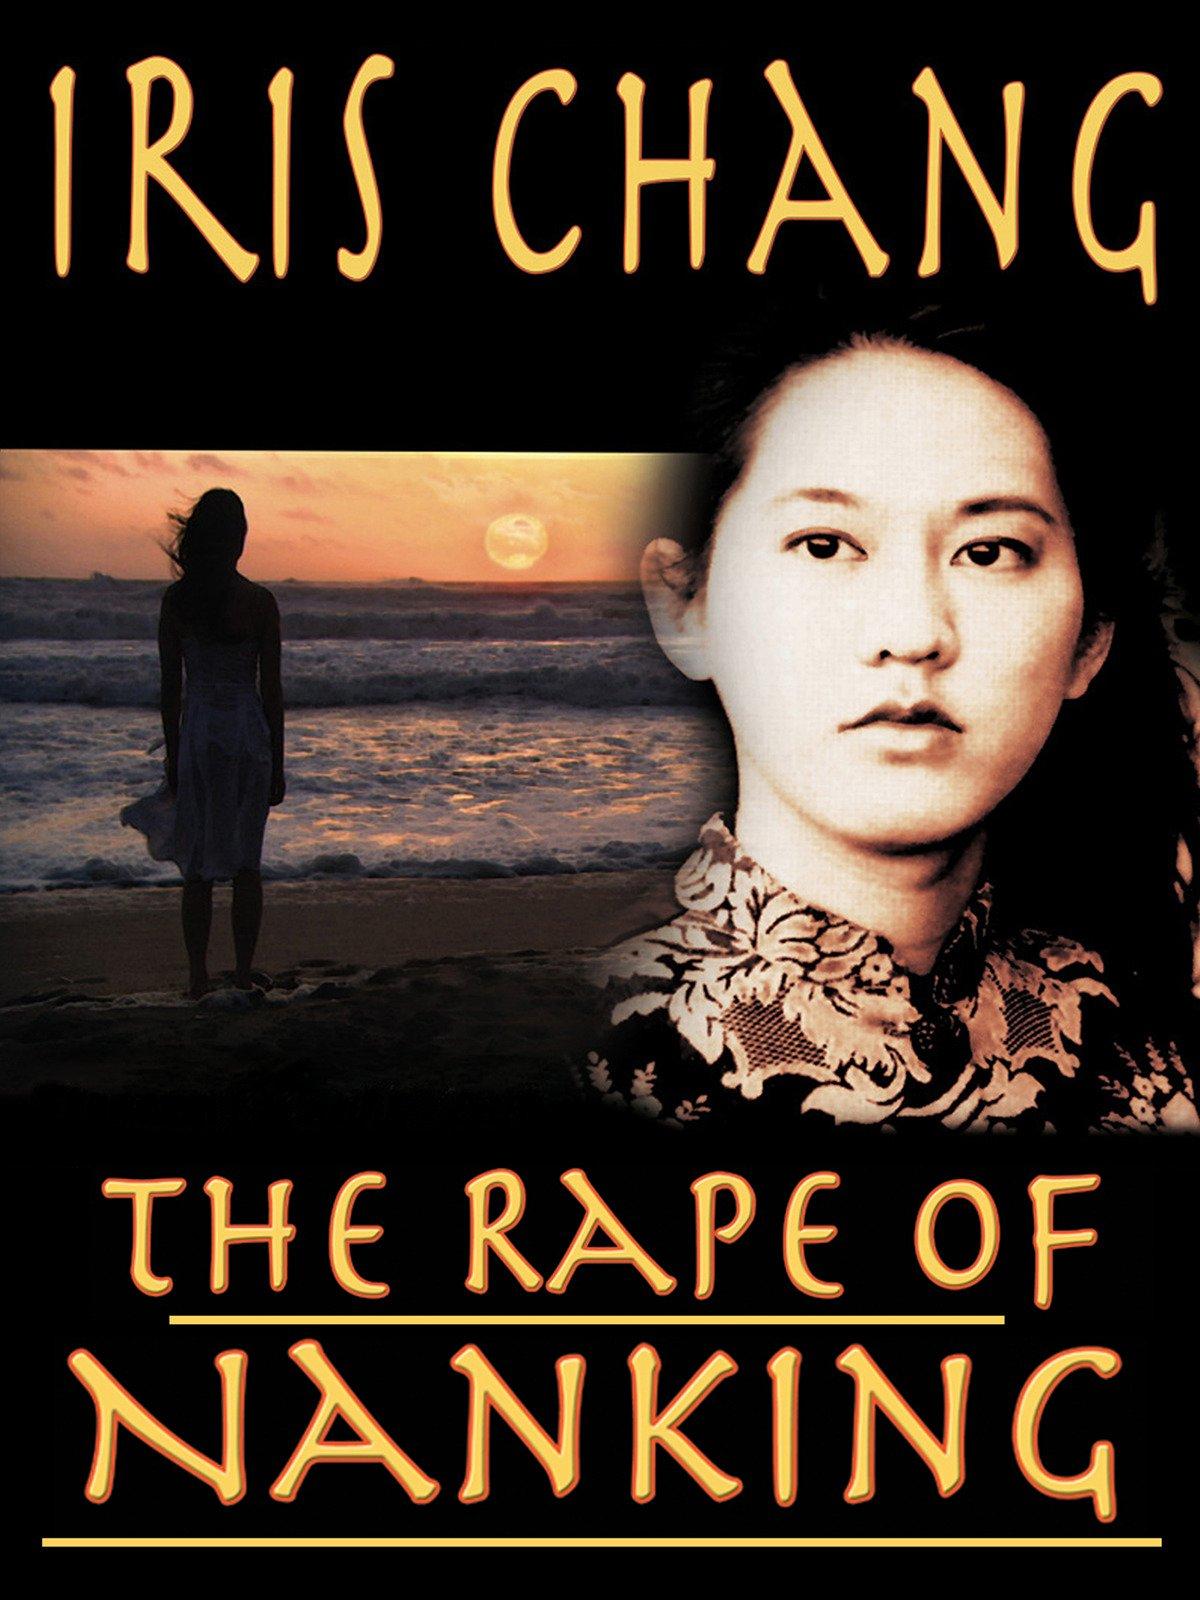 Watch The Rape of Nanking | Prime Video